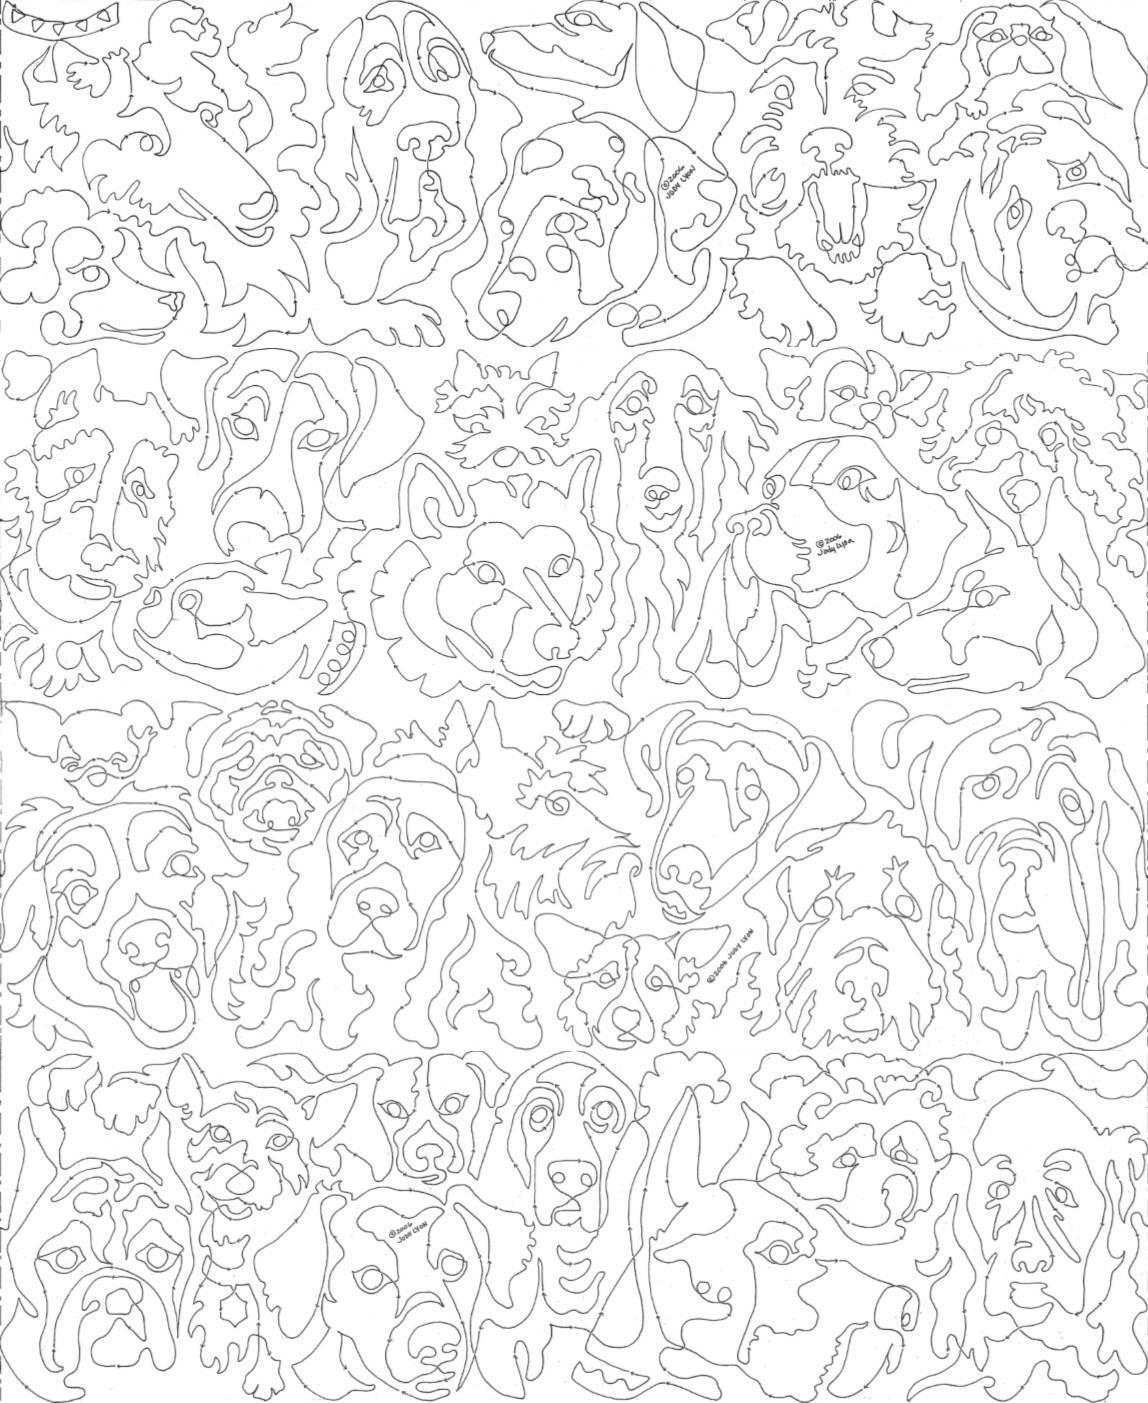 Dawgs 11 Pictogram Meadowlyon Designs